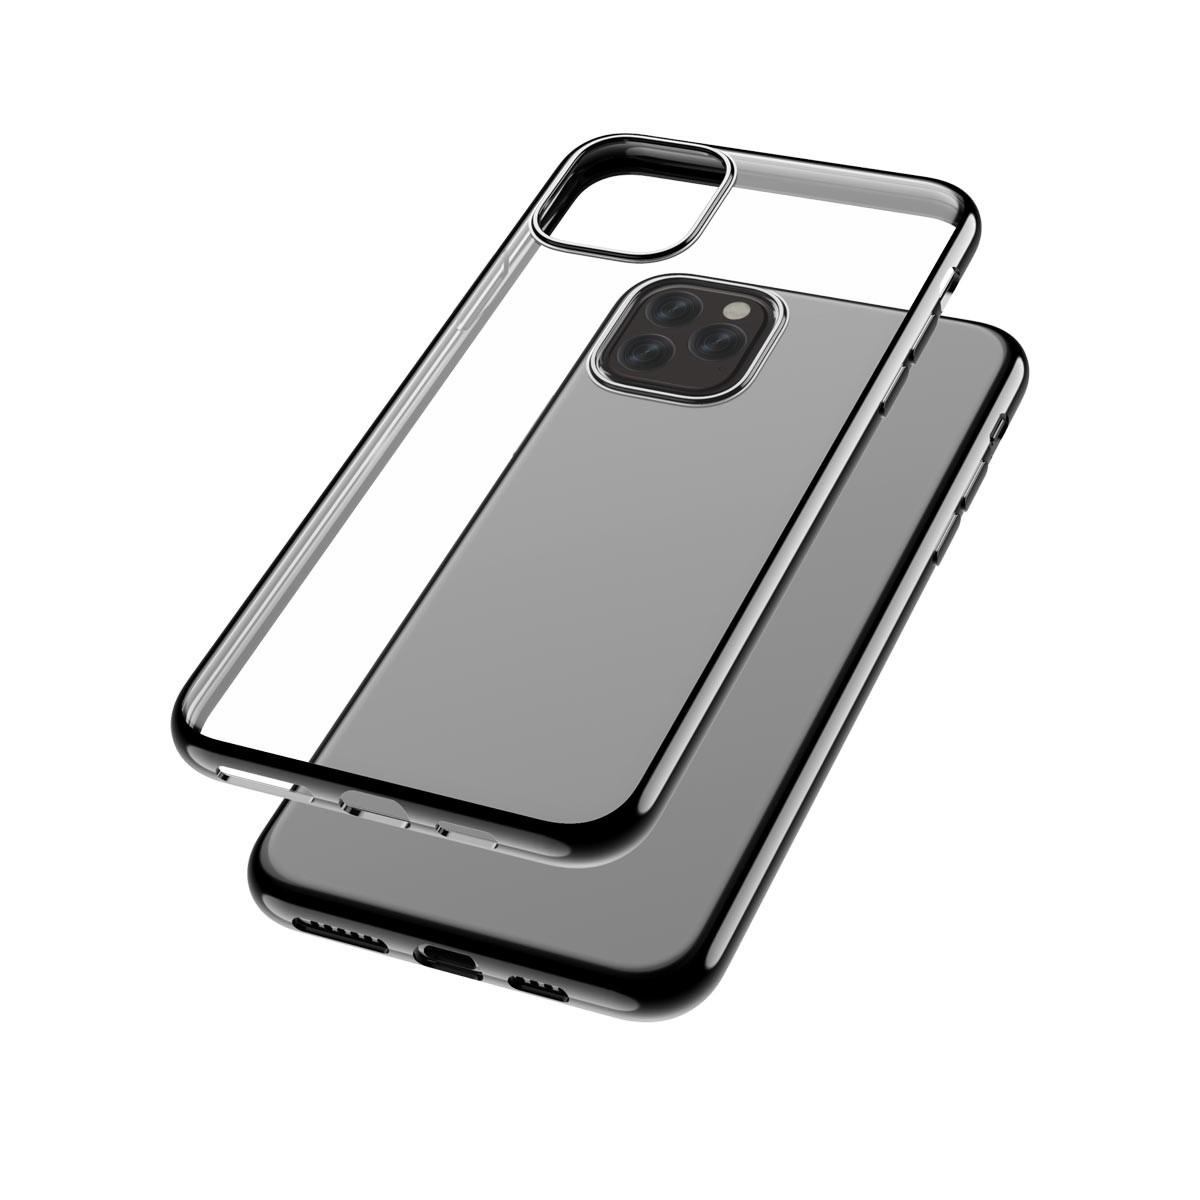 Capac protectie spate cellara colectia electro pentru iphone 11 pro max - negru